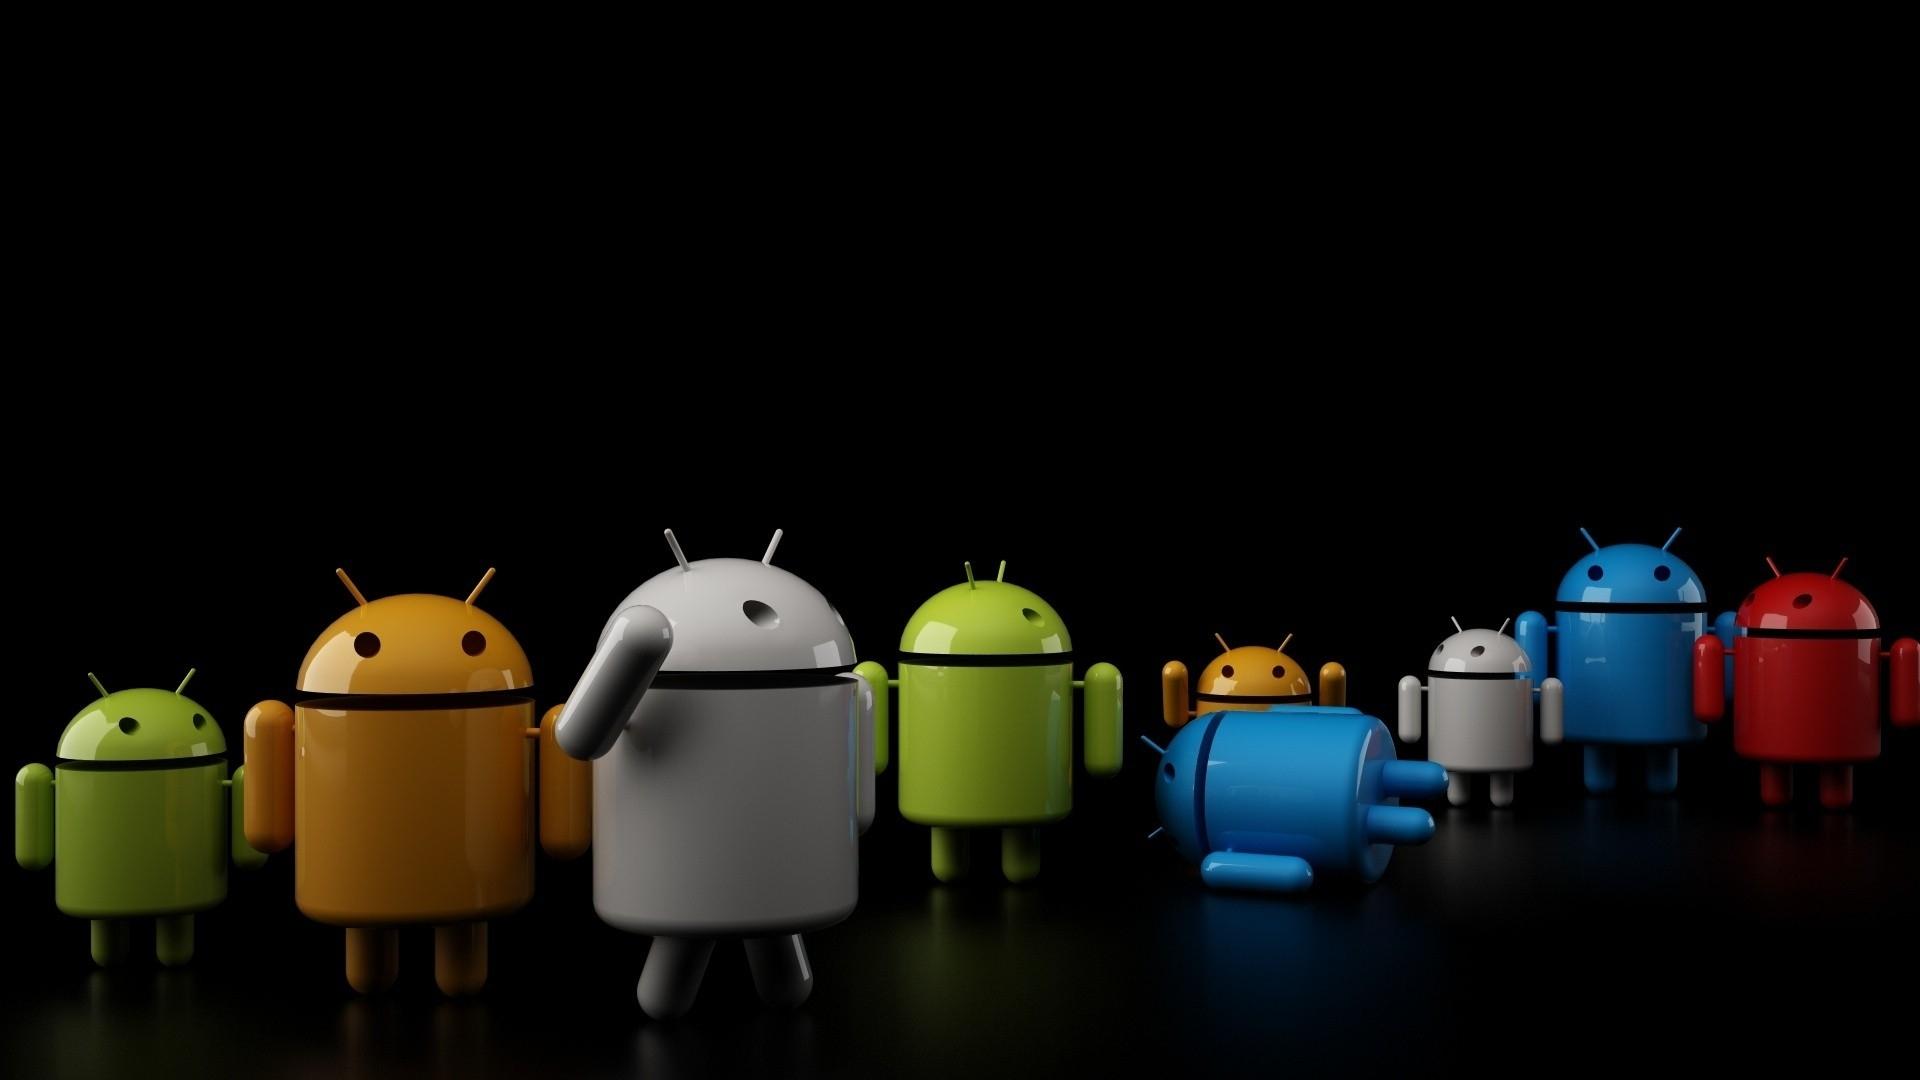 download wallpaper 1920x1080 robot, android, dark full hd 1080p hd